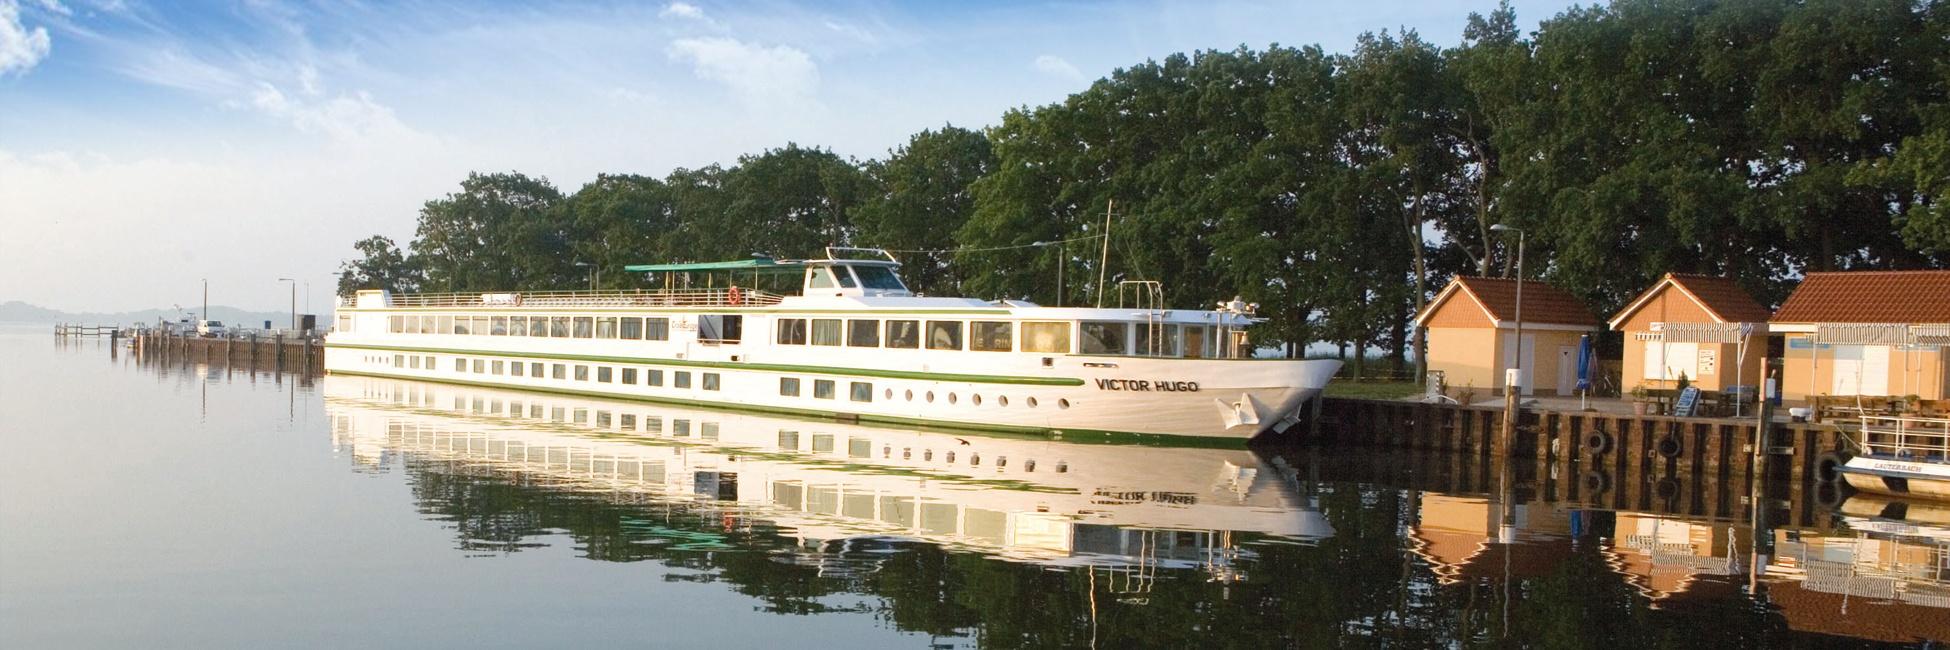 MS Victor Hugo, navire 4 ancres